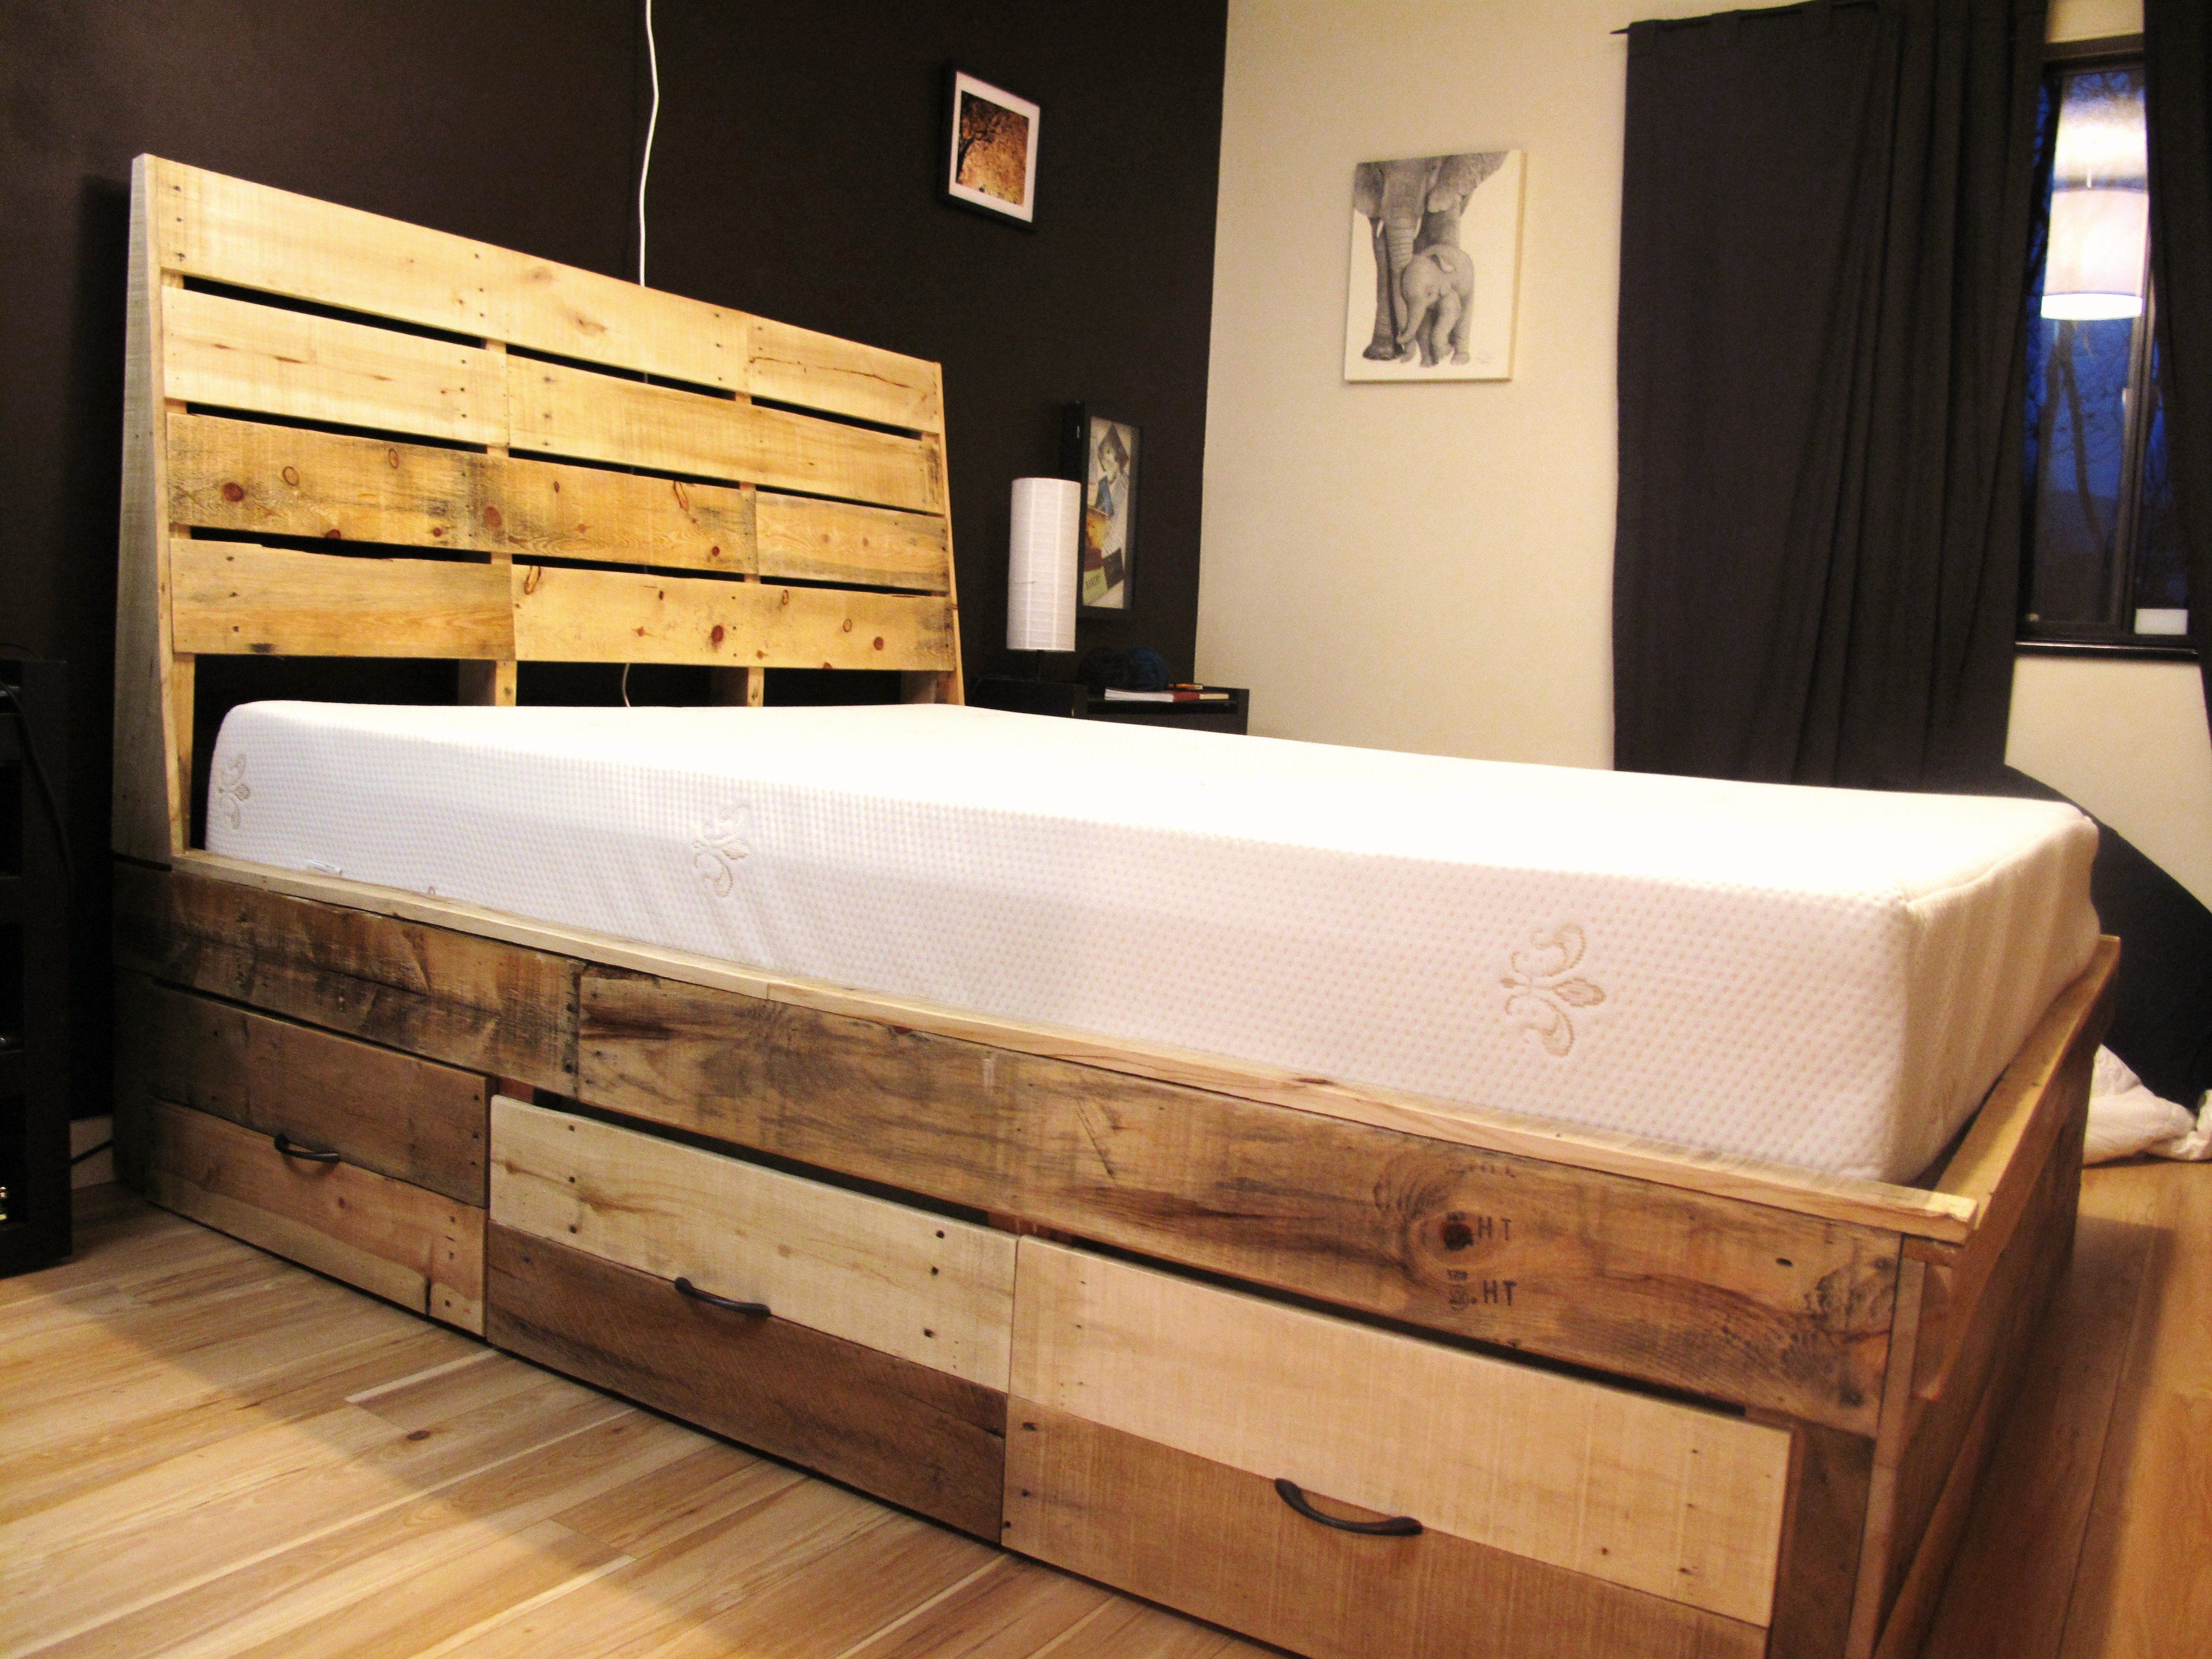 Bedroom Furniture Made Out Of Pallets best bed frames fascinating black color wooden frames and slopping